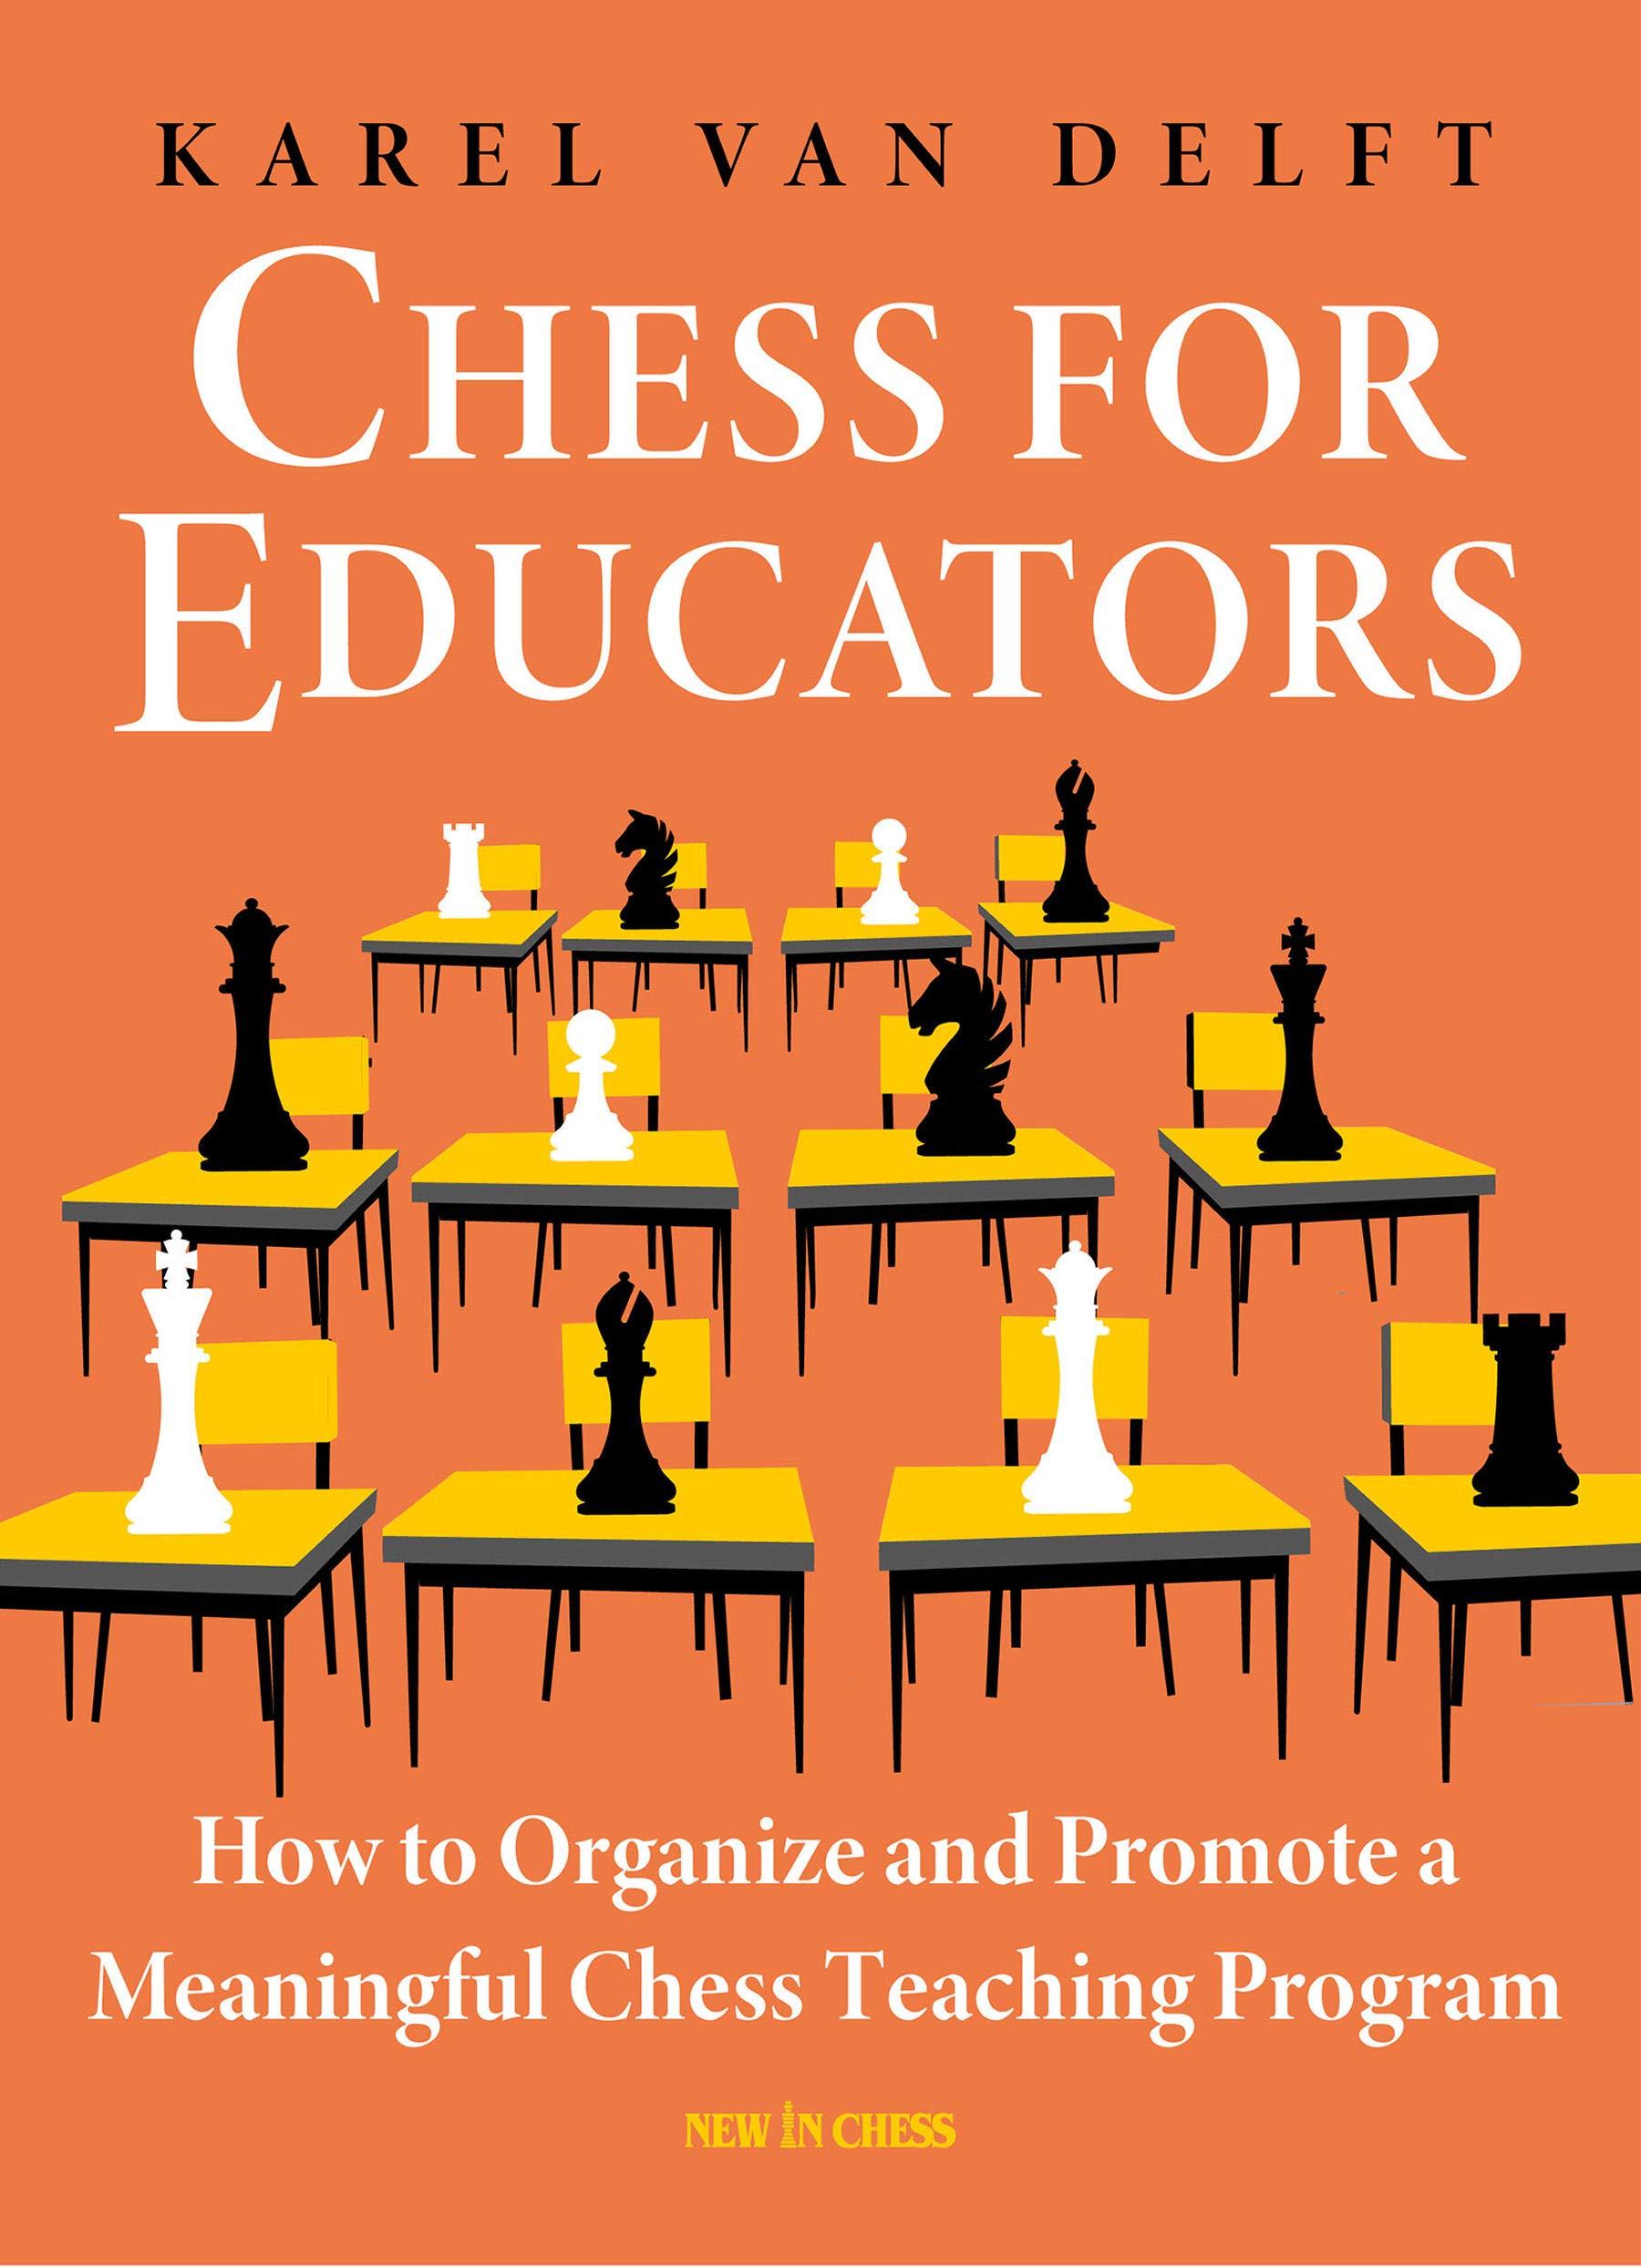 Chess for Educators, Karel van Delft, New in Chess, March 2021, ISBN: 9789056919429